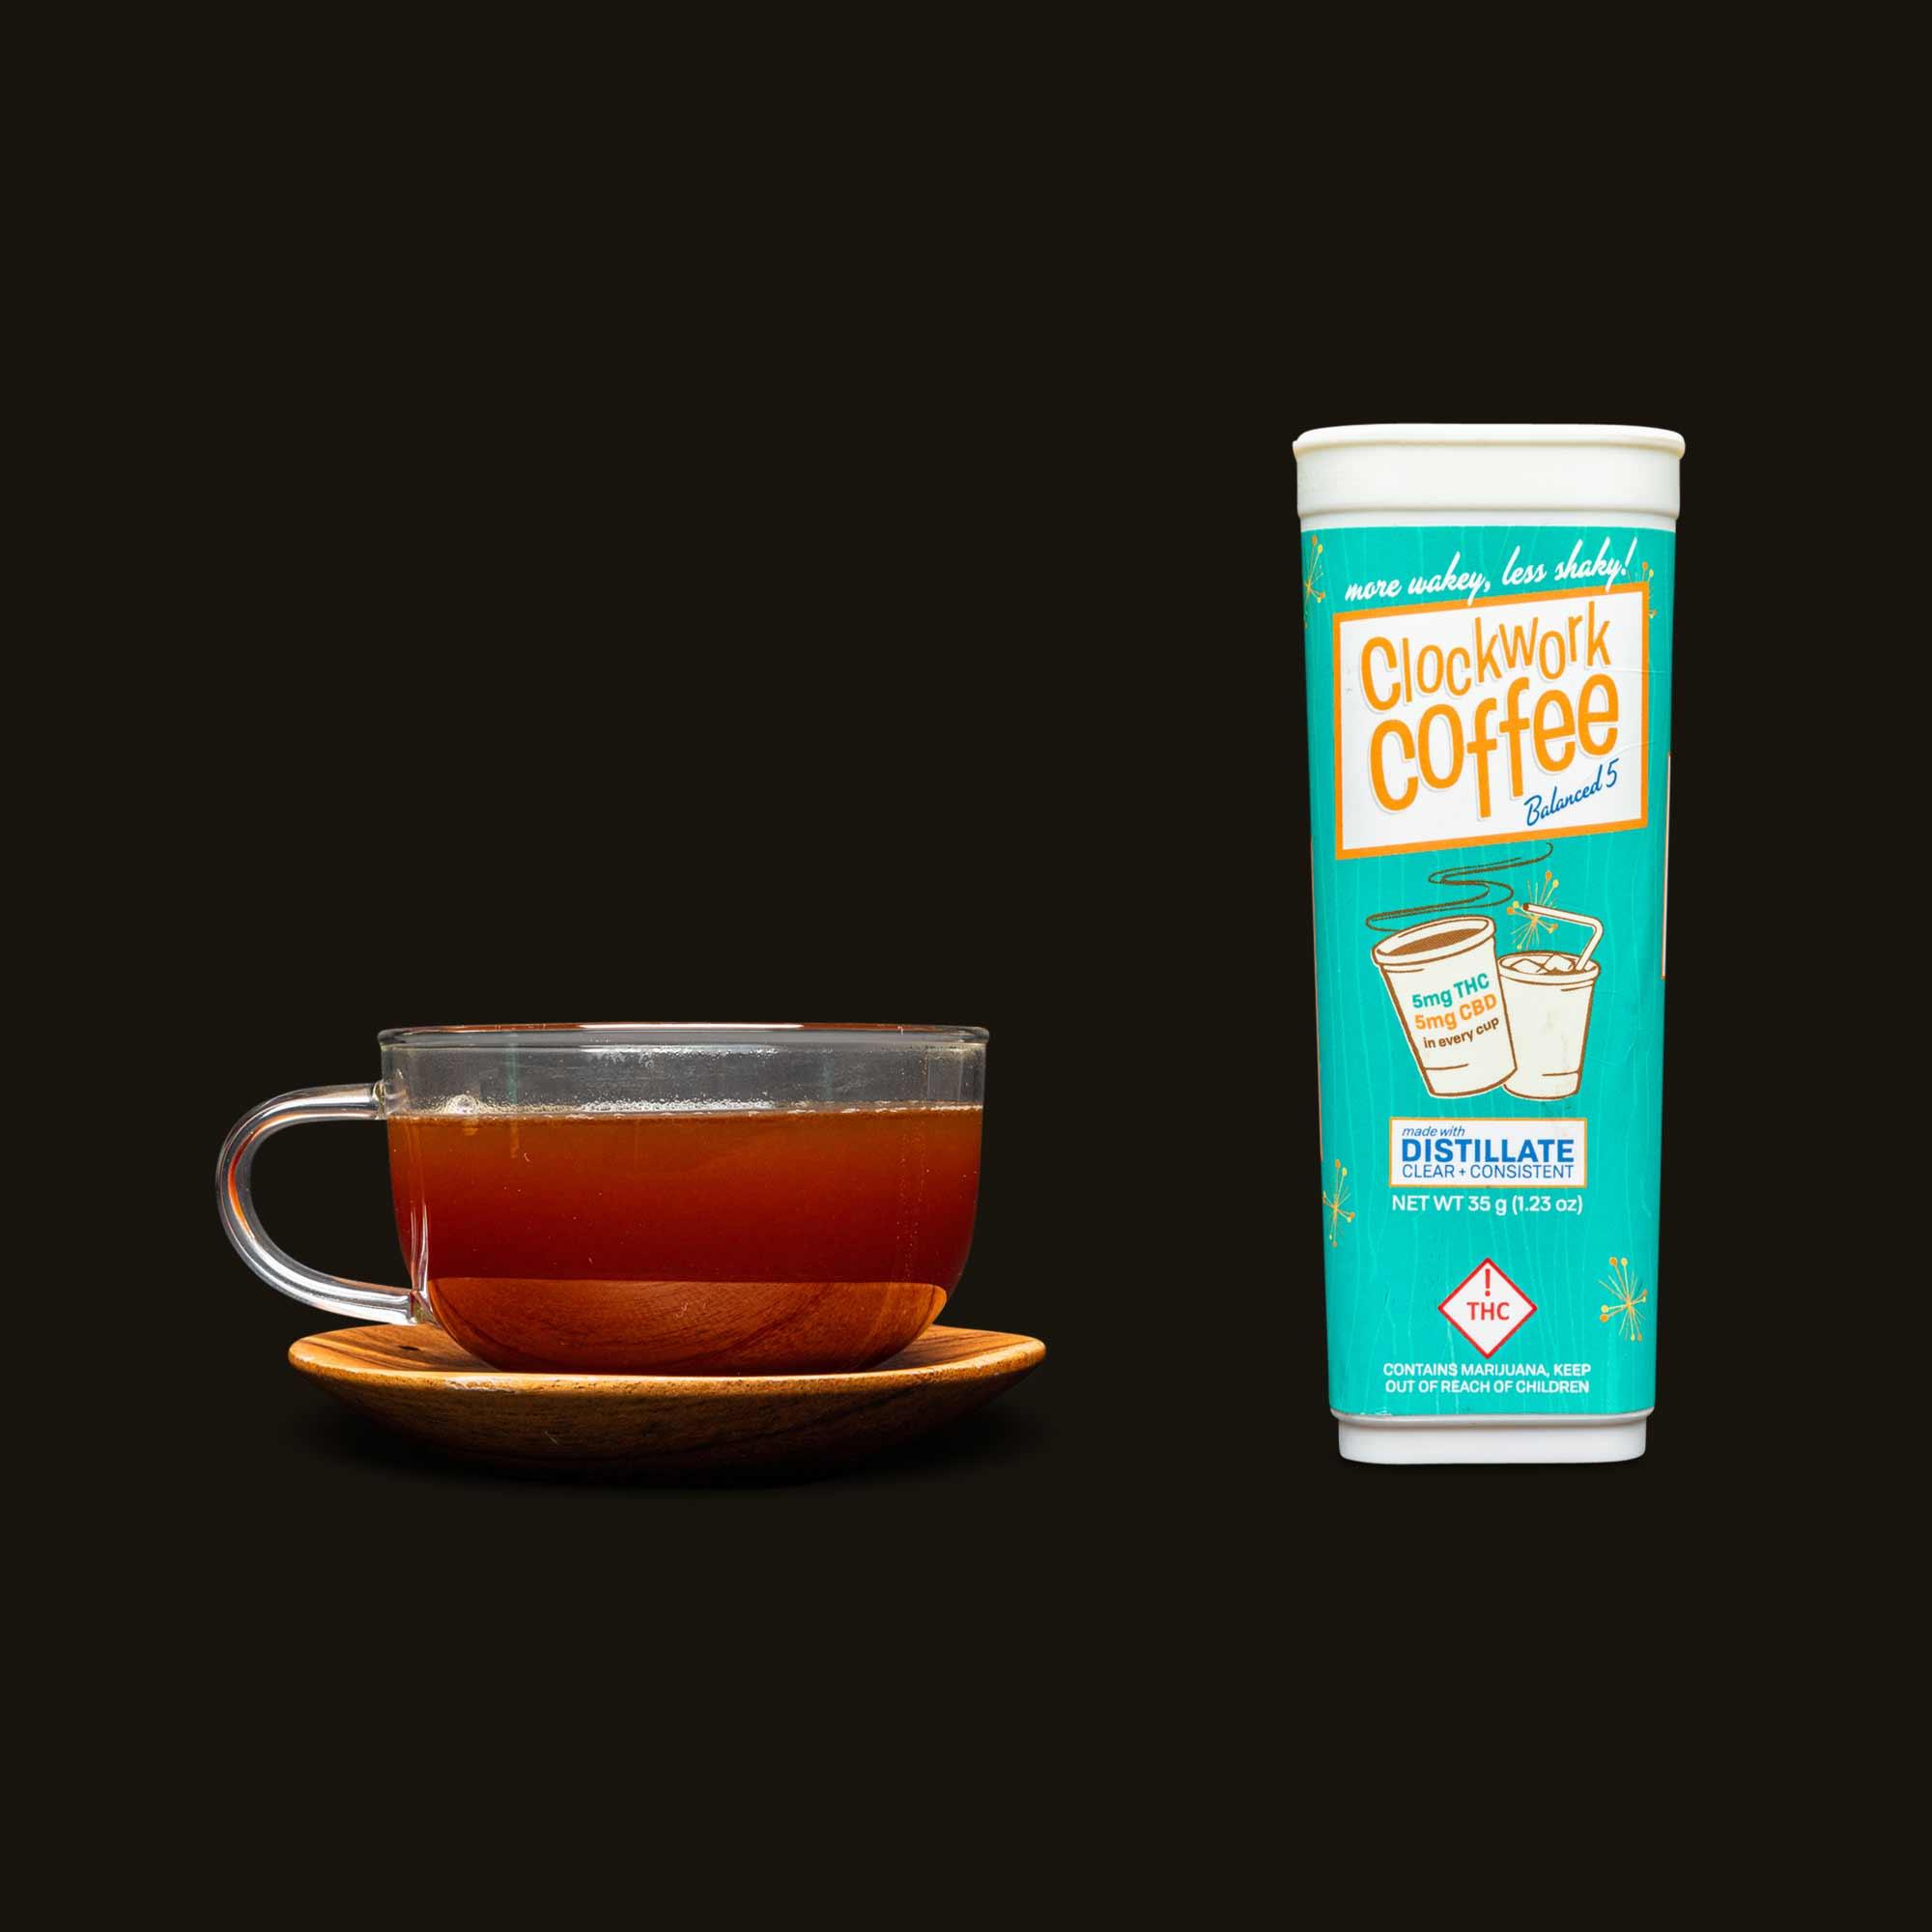 Stillwater Clockwork Coffee Balanced 5